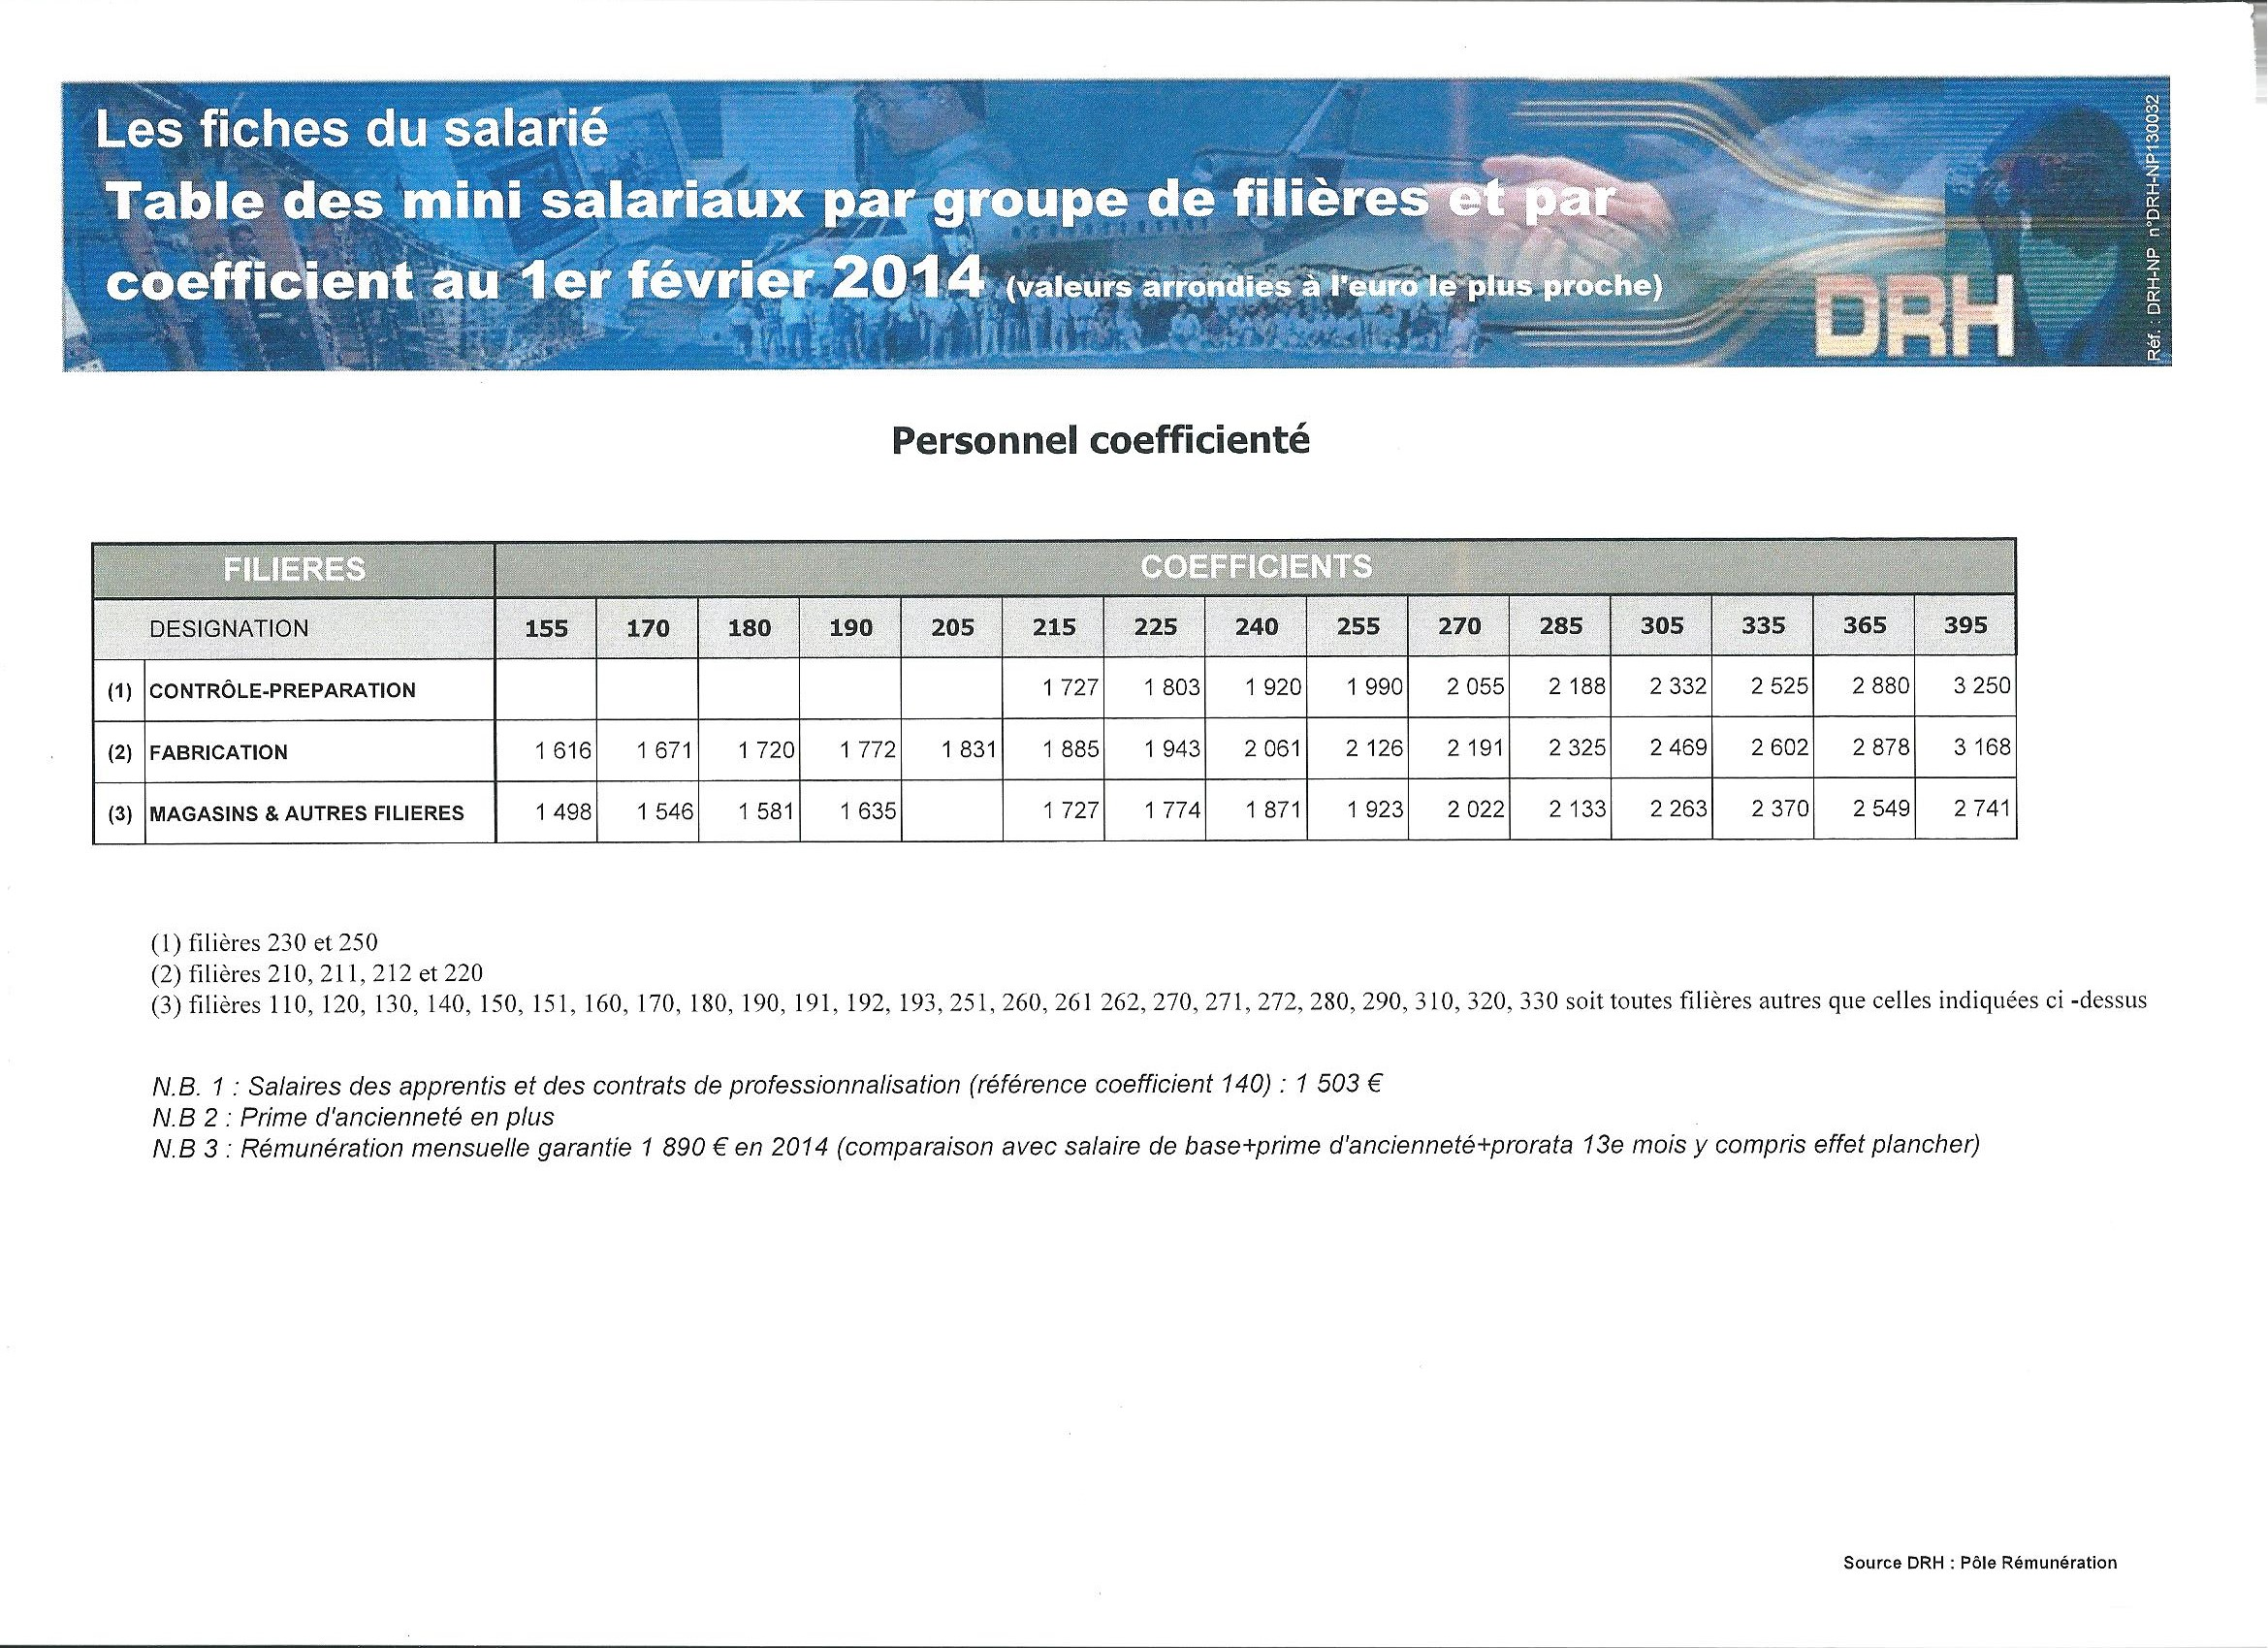 Grille des salaires du batiment 2016 basse normandie grille batiment janvier 2016 - Grille des salaires du batiment ...